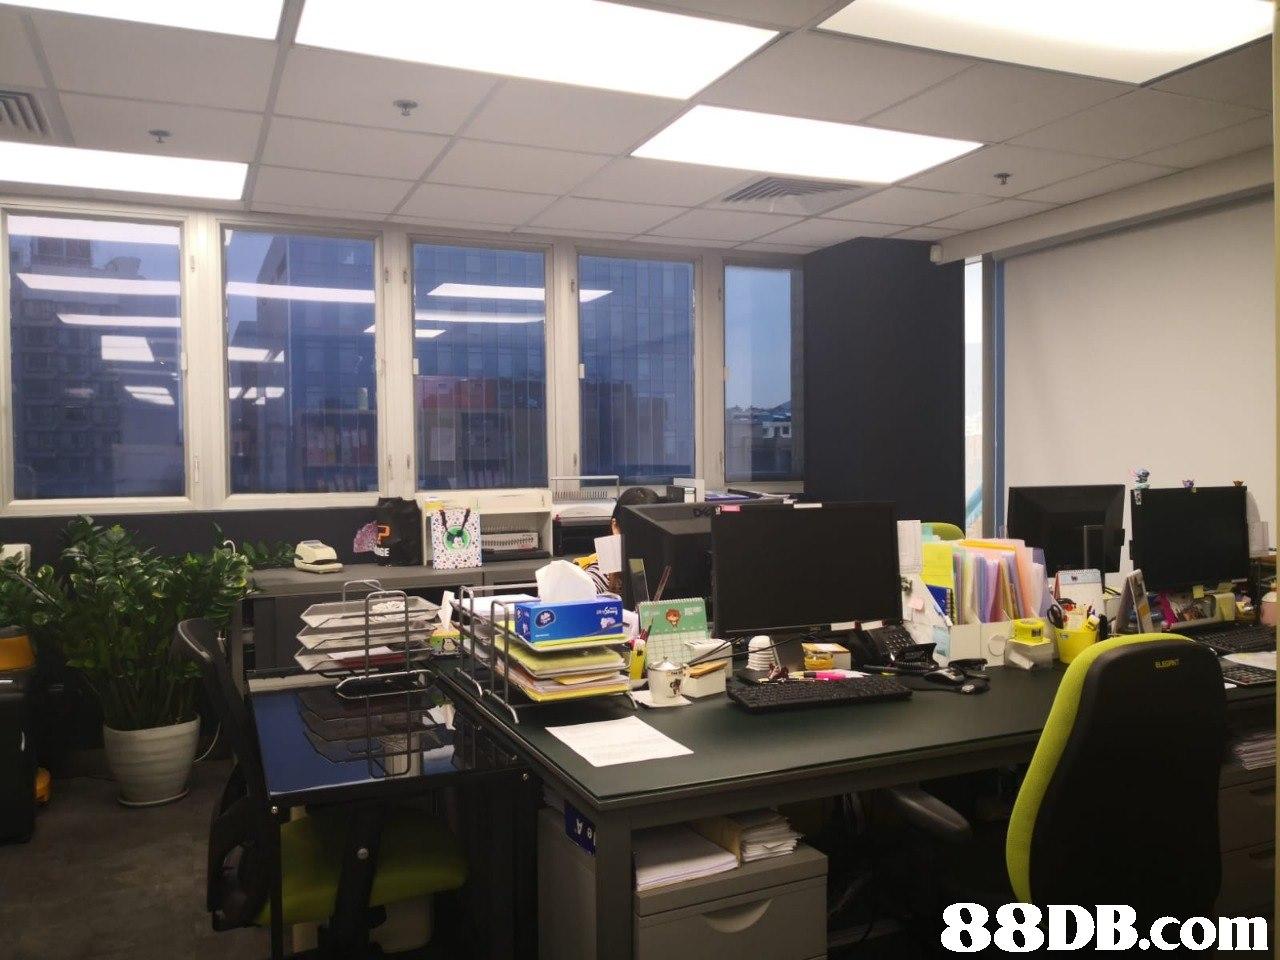 Office,Building,Interior design,Desk,Room